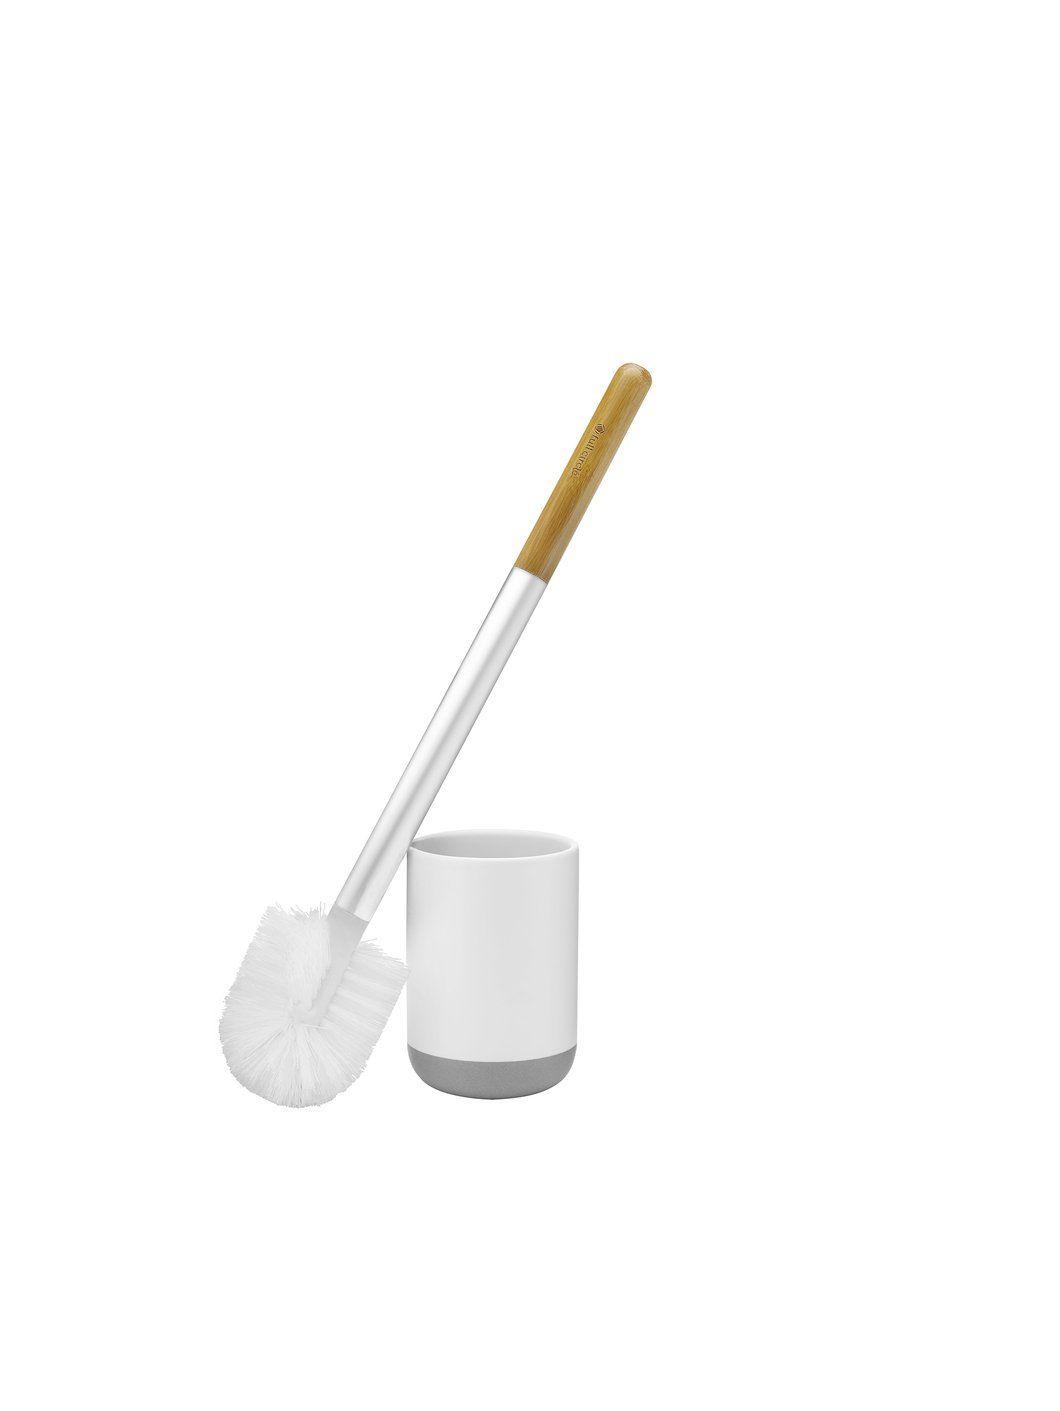 Scrub Queen Bamboo Care Toilet Brush Toilet Bowl Brush